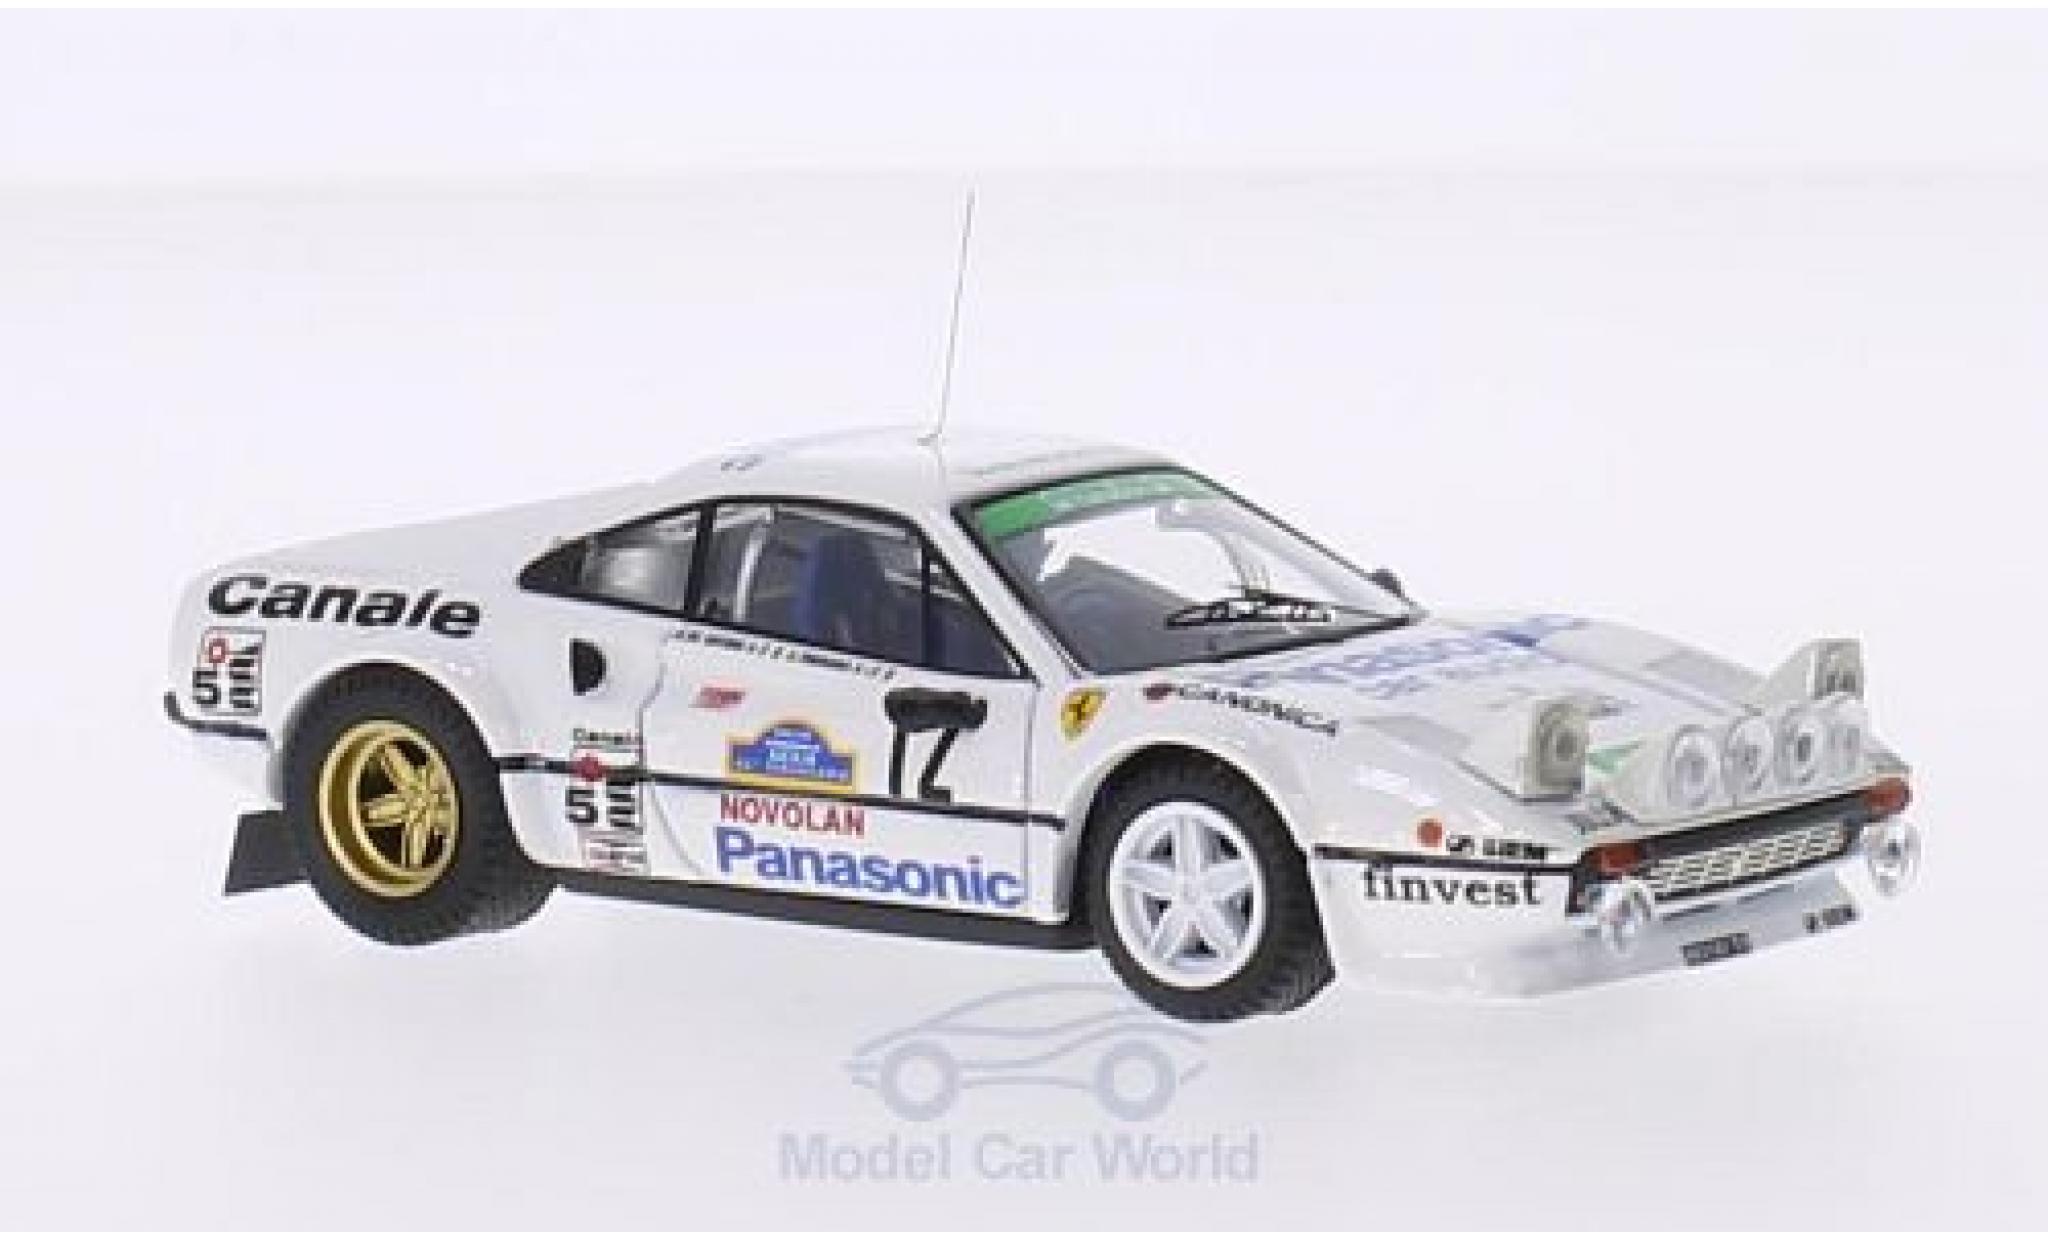 1:43 decal Racing43-Ferrari 308 gtb-Pionner-Tour de Frace Auto 1982